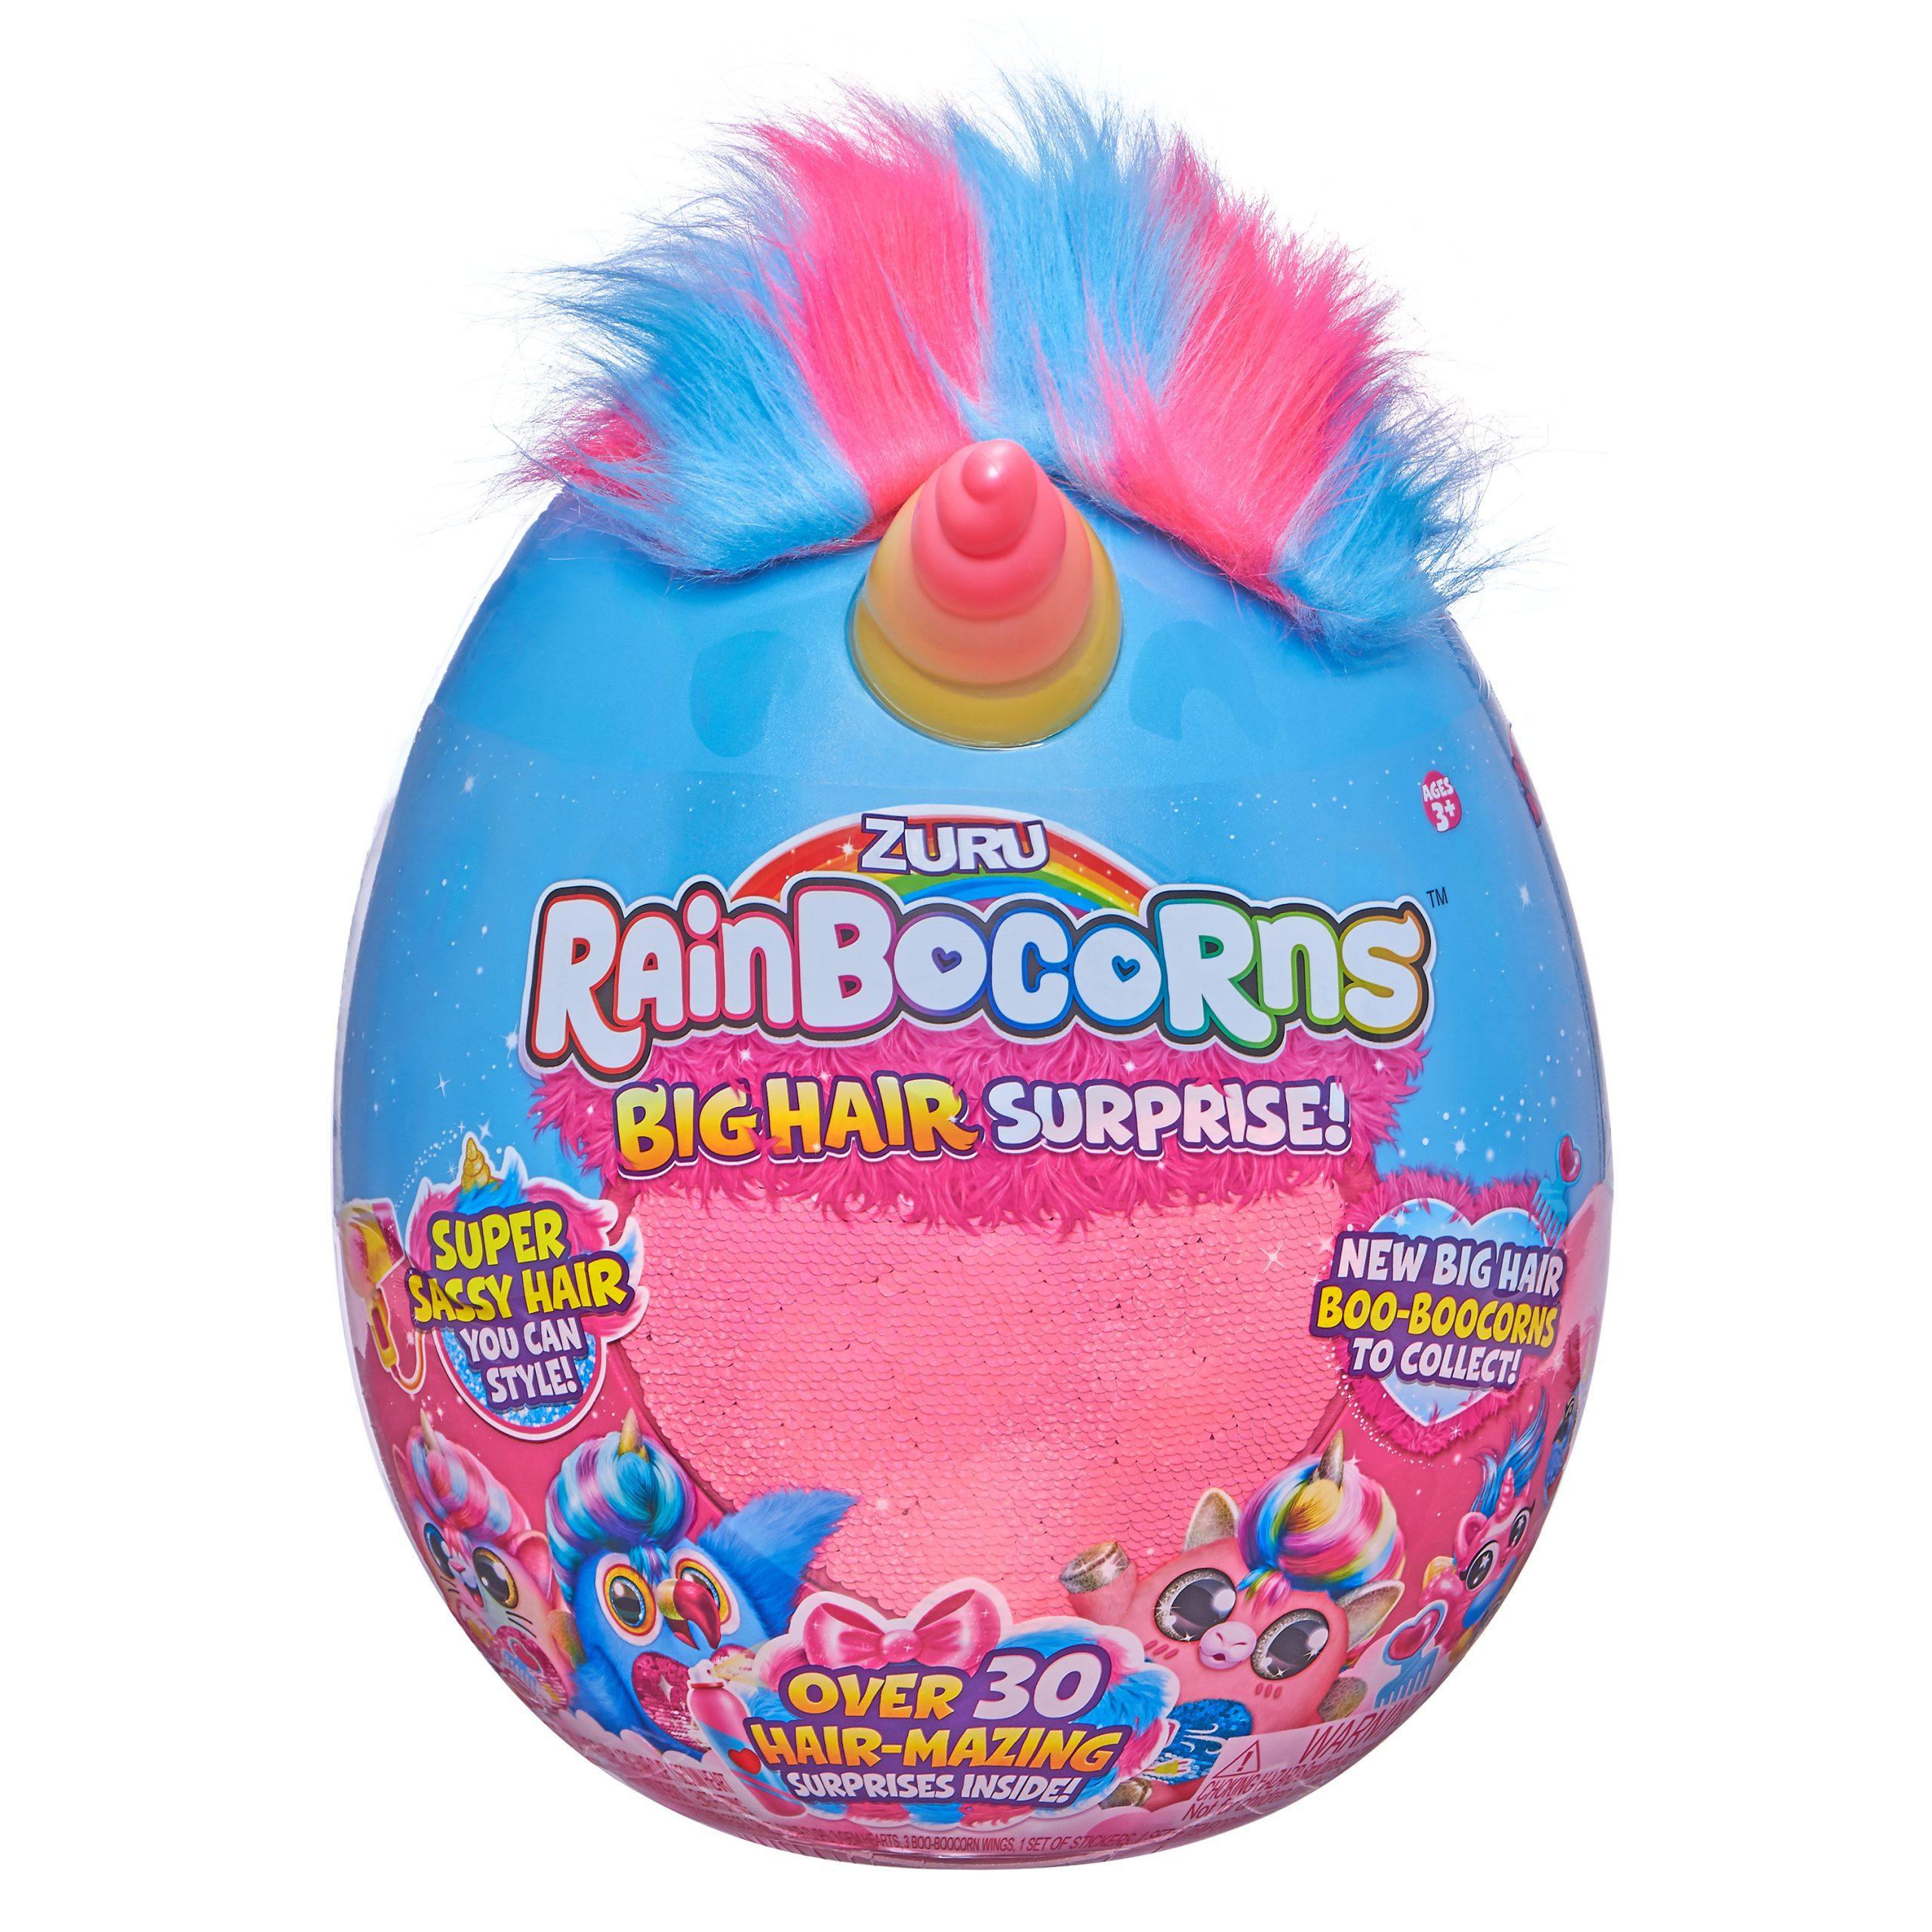 Rainbocorns Big Hair Surprise by ZURU Only $34.84 (Reg $48.82) + Free Store Pickup at Walmart.com!